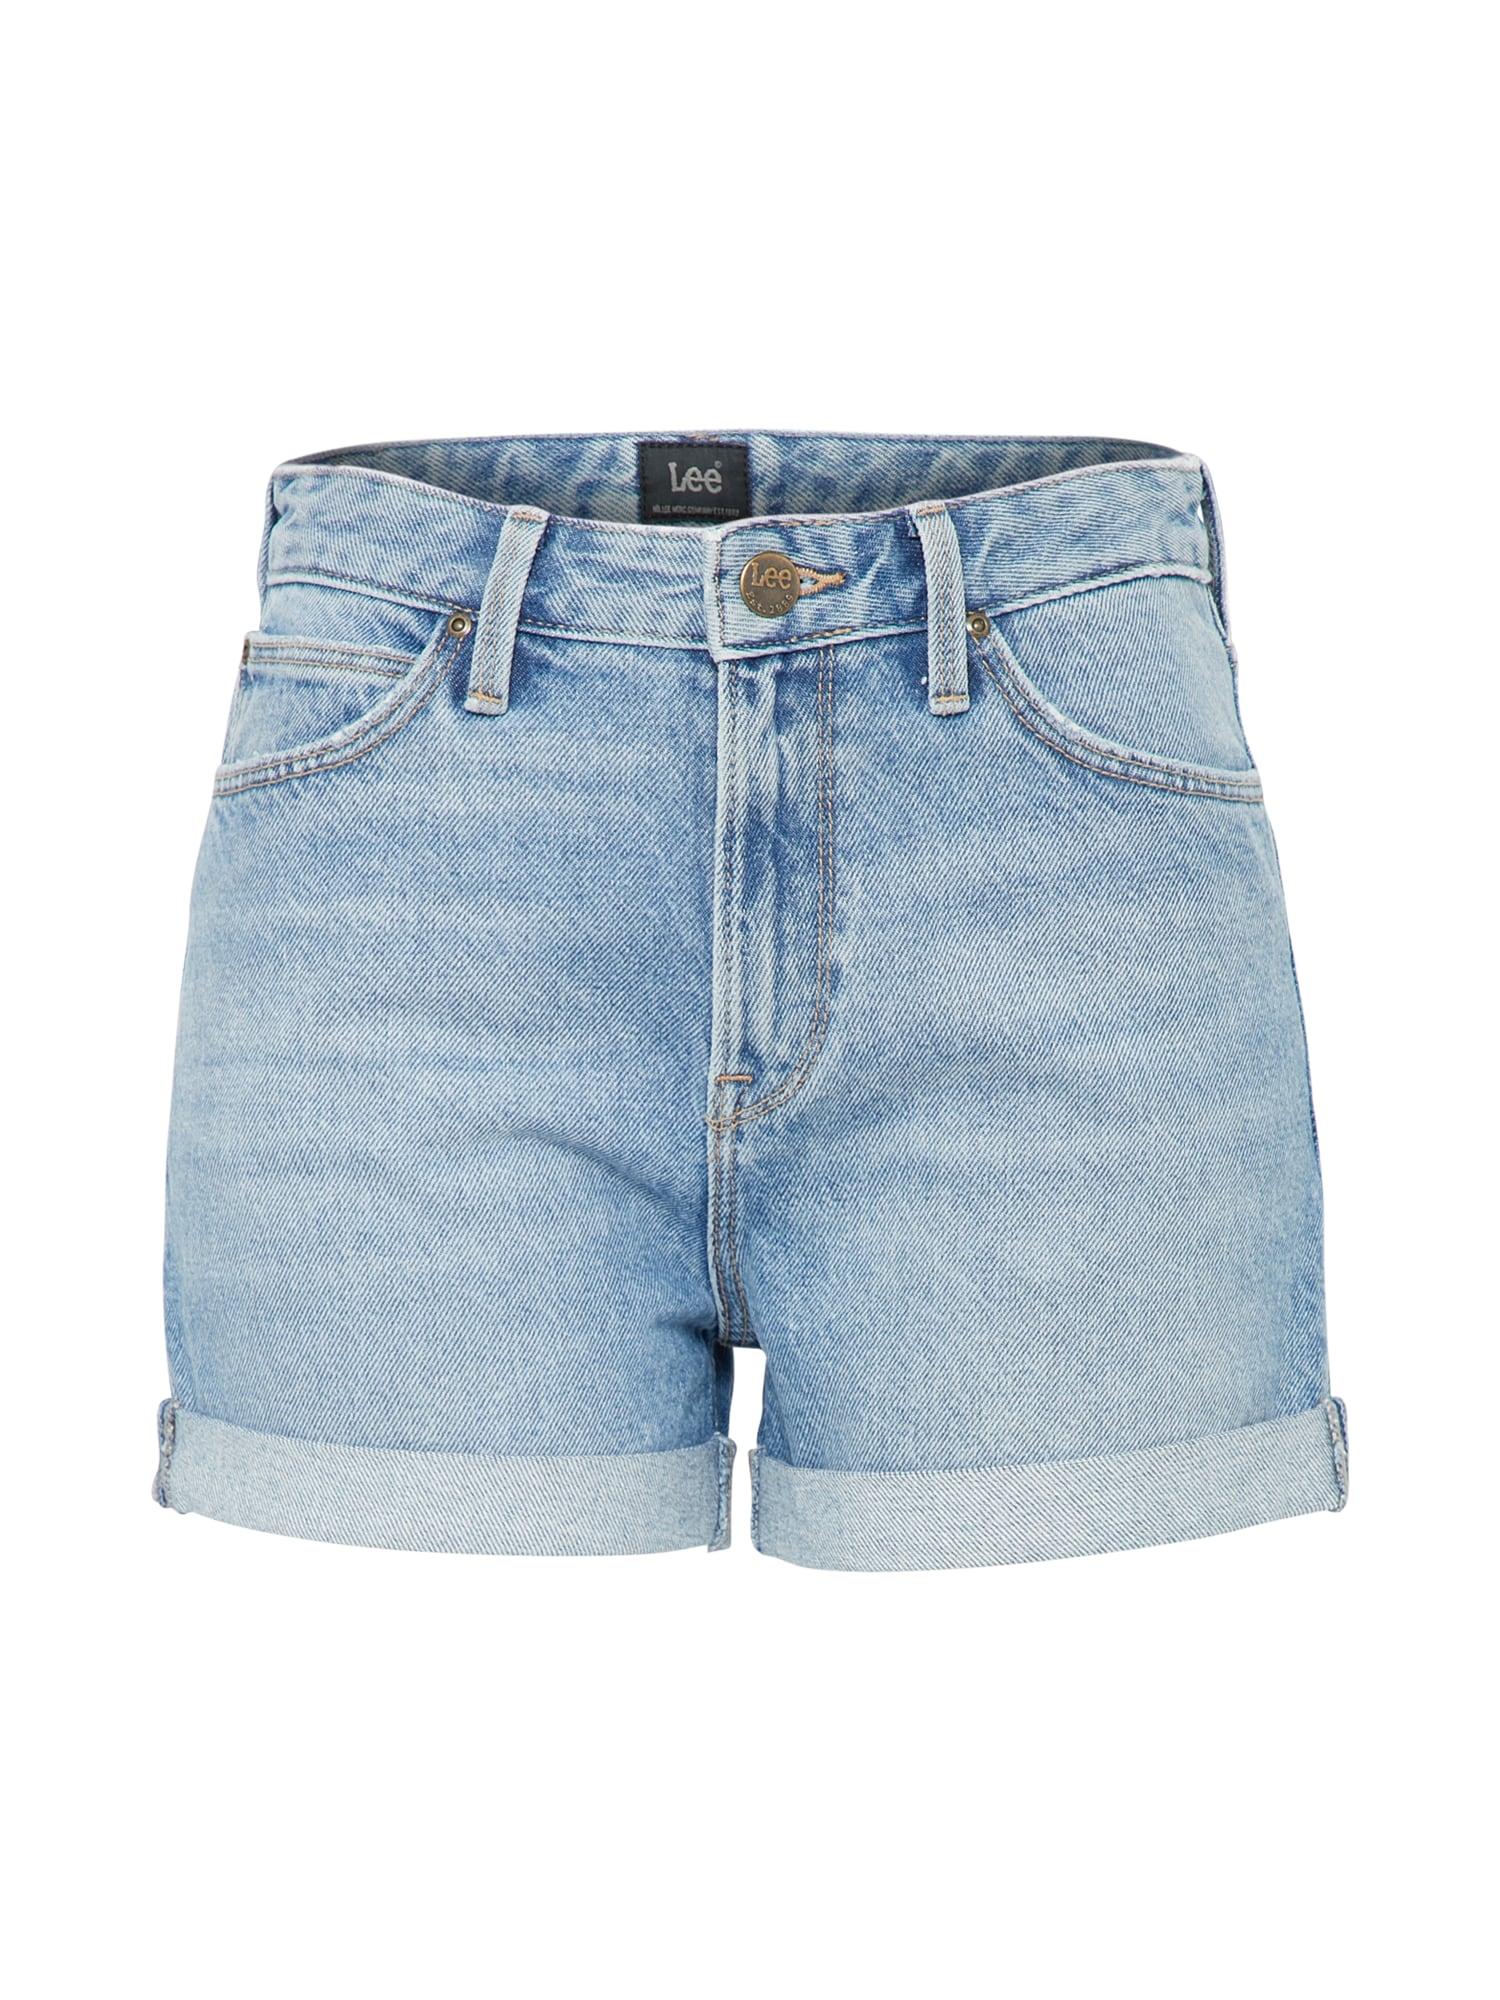 Lee Dames Jeans MOM SHORT blauw denim